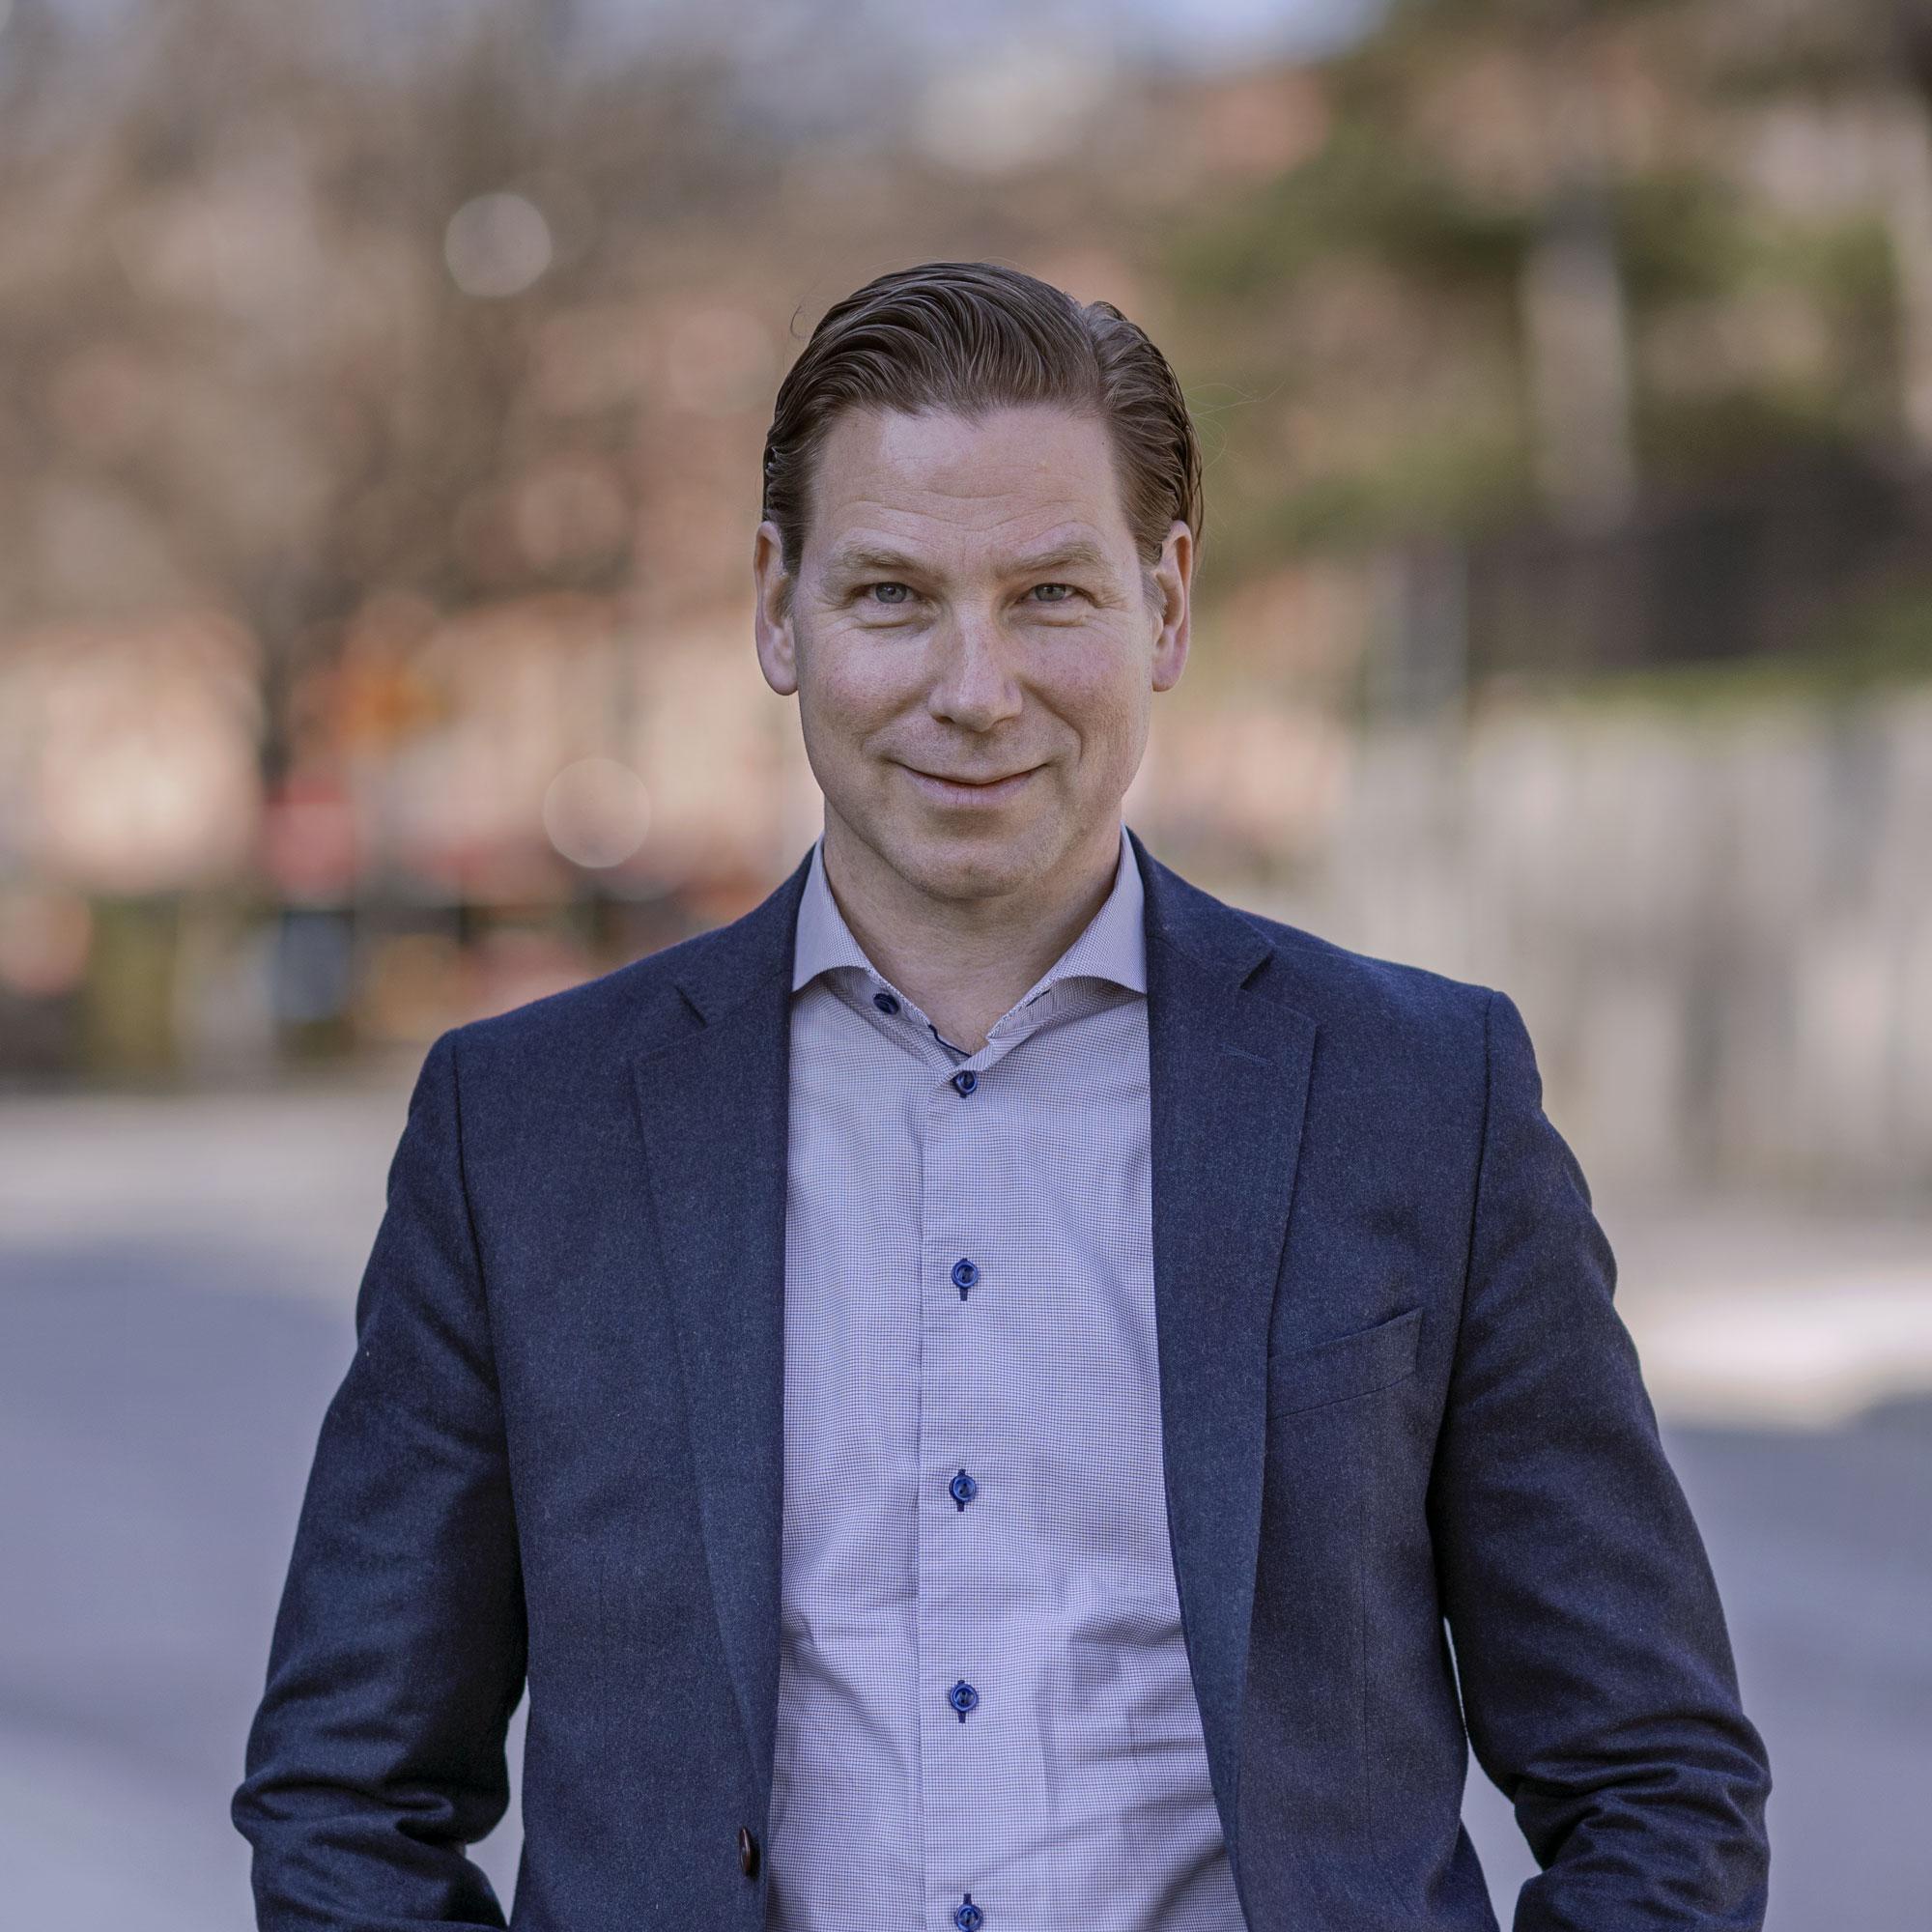 Magnus Silfverberg